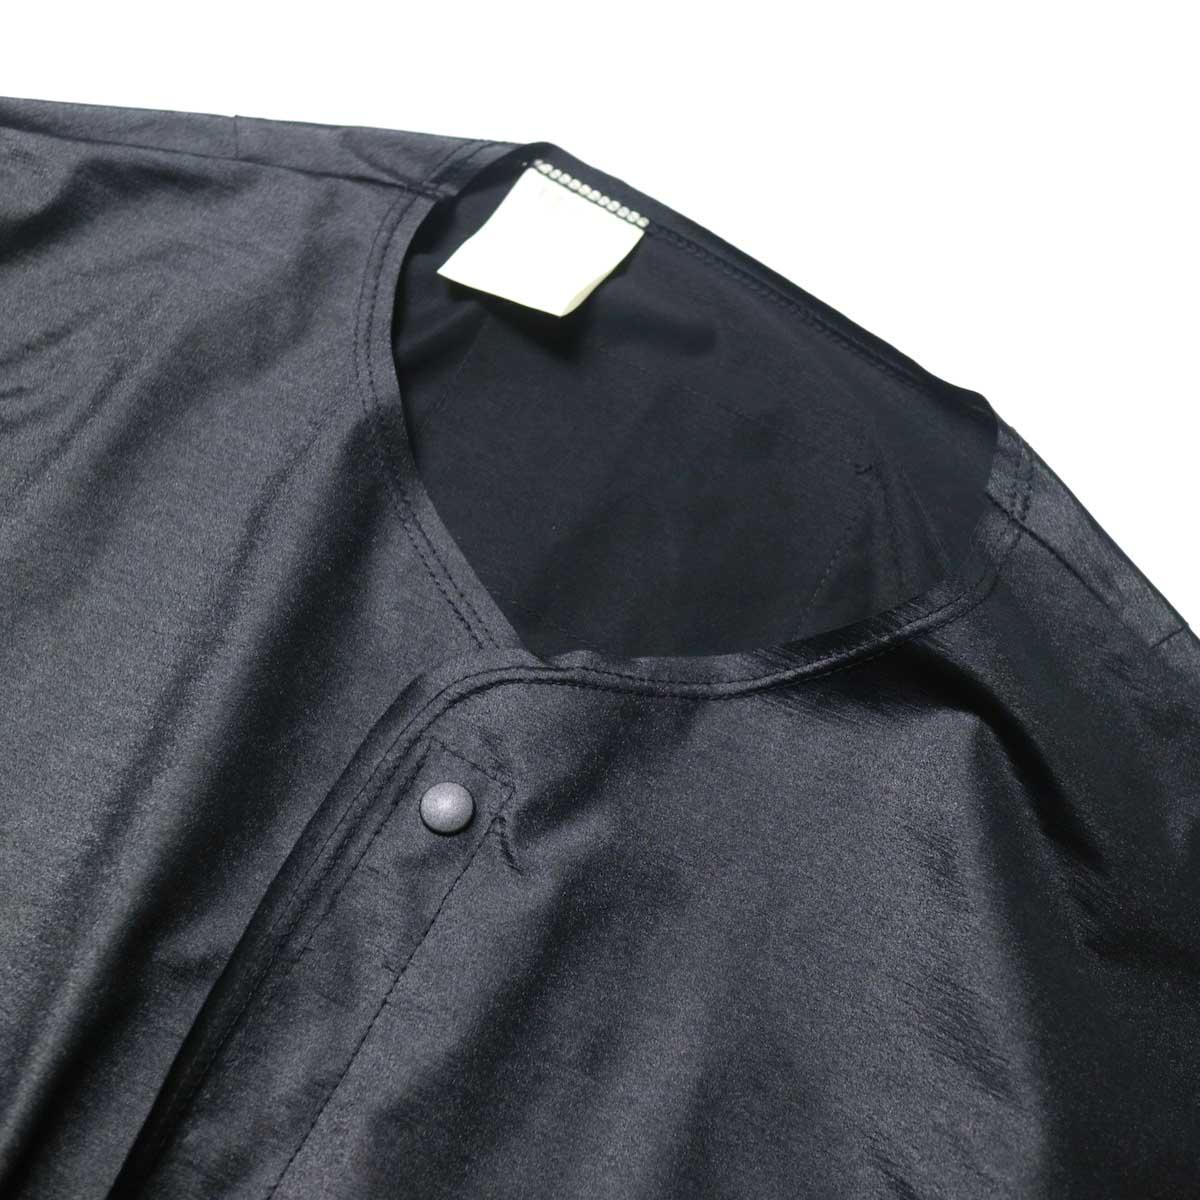 N.HOOLYWOOD / 9211-SH07-010 pieces Shirt Cardigan (Black)ノーカラー